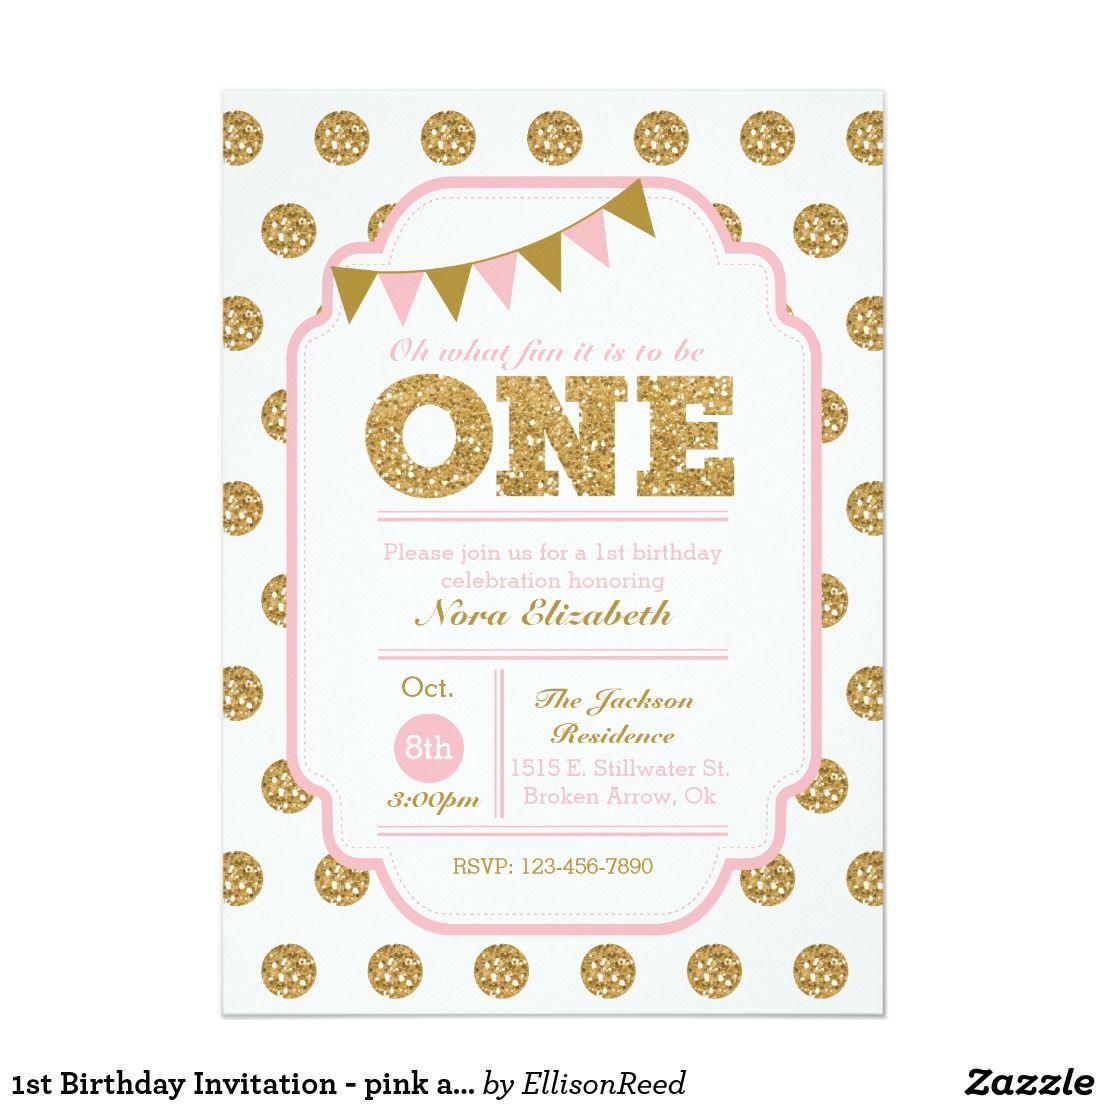 1st Birthday Invitation - pink and gold polka dots | Pinterest ...